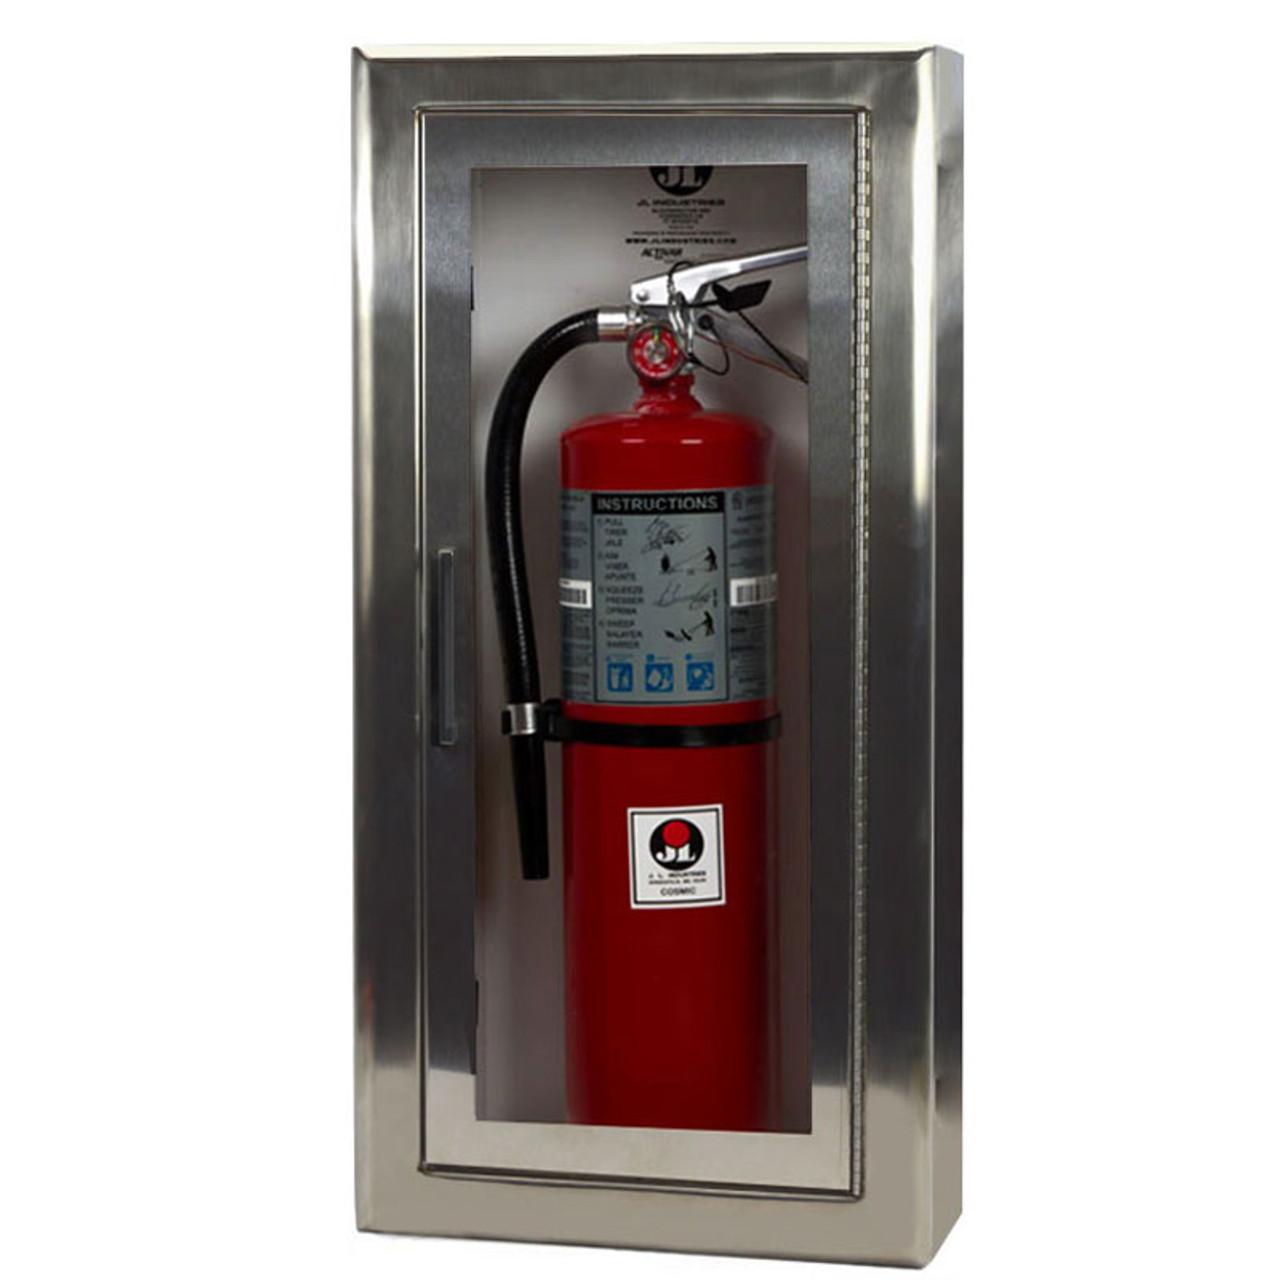 Semi Recessed Stainless Steel Fire Extinguisher Cabinet Cosmopolitan Jl Industries